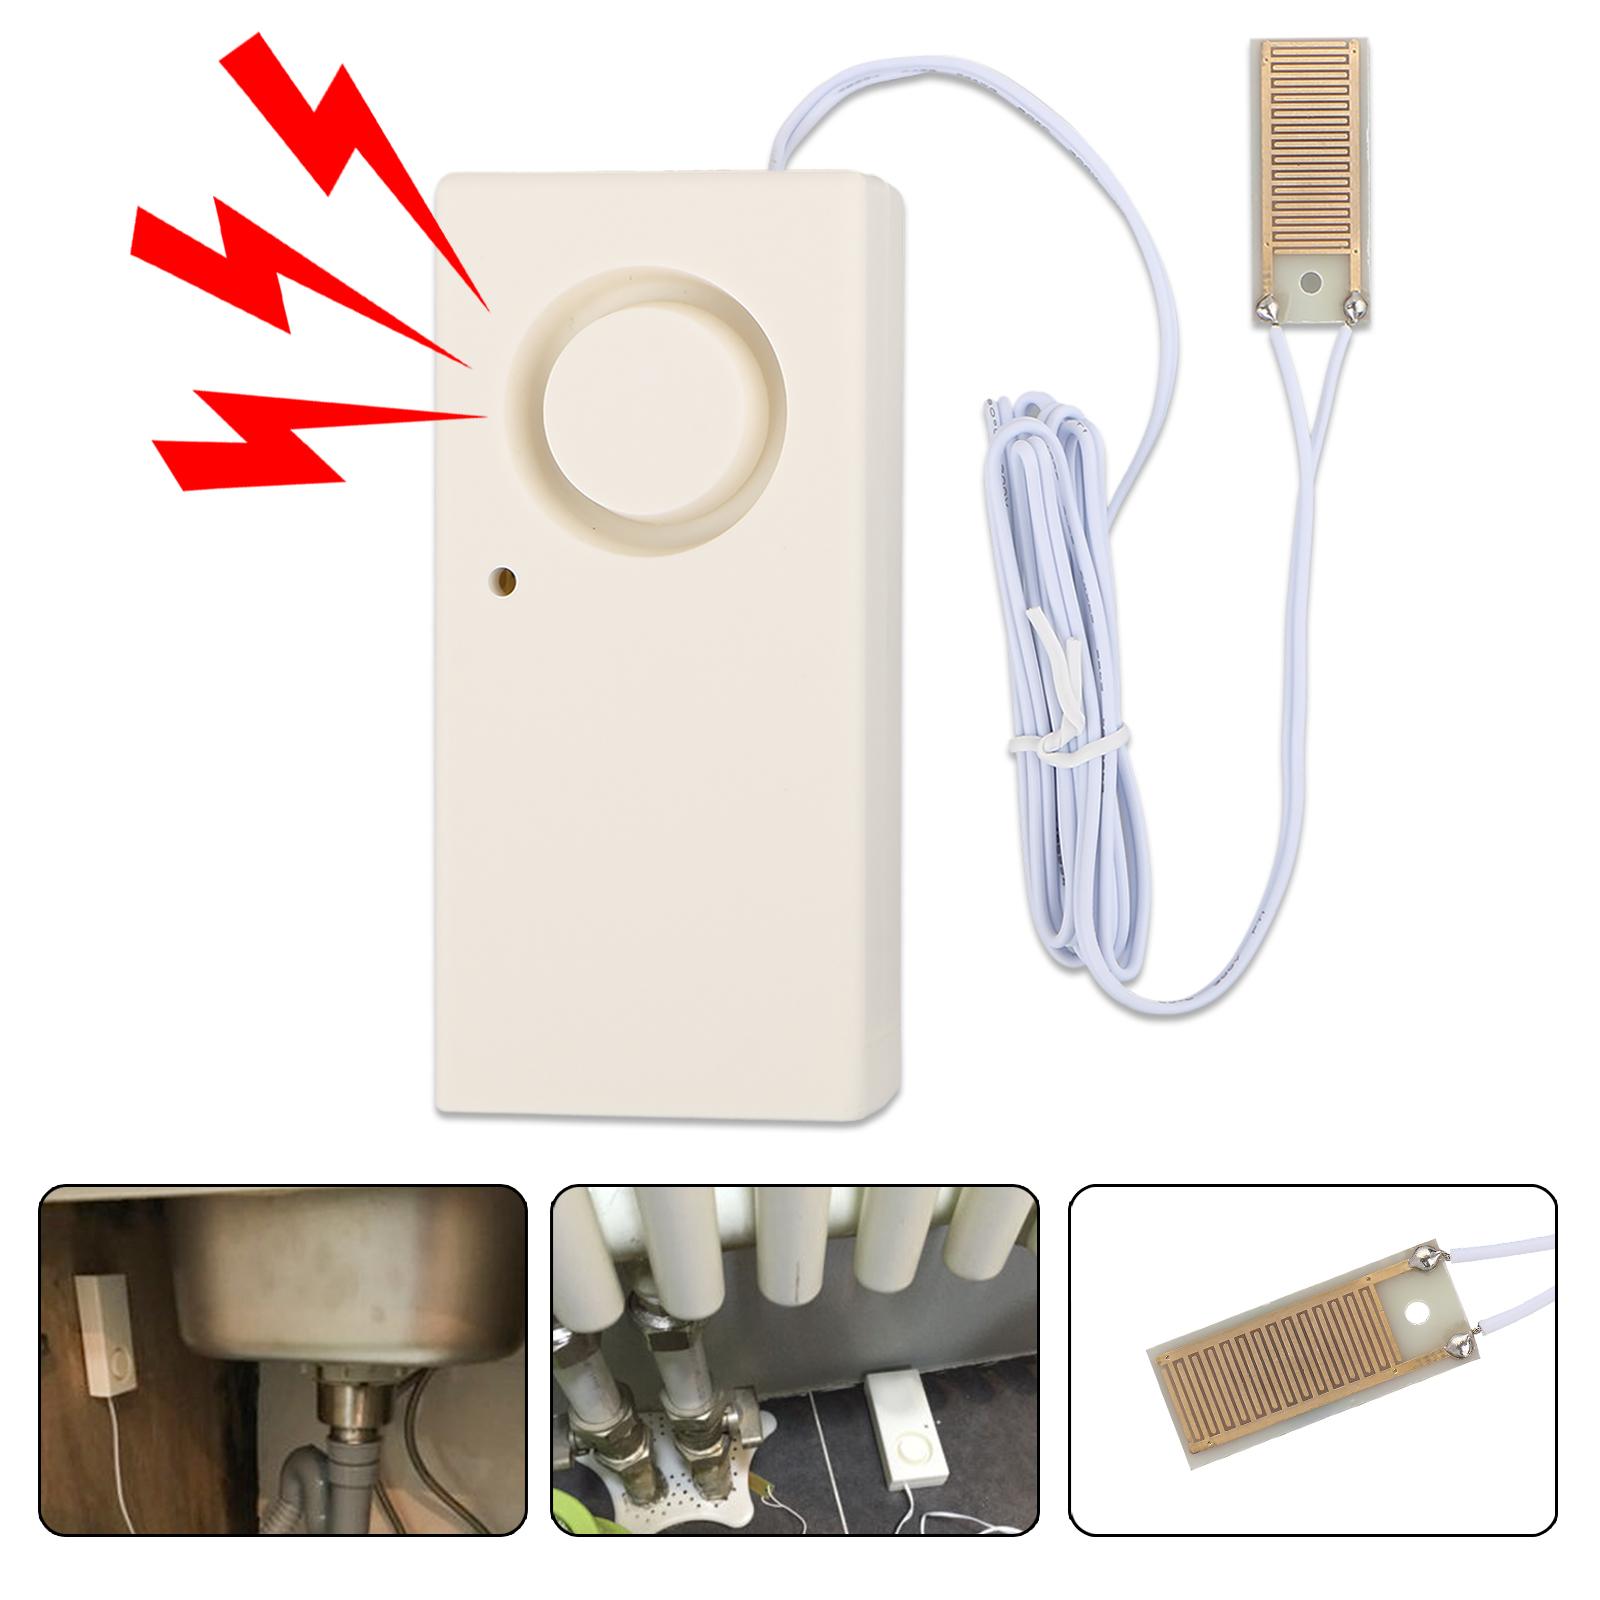 130dB Home Water Leak Leakage Detection Detector Sound Alarm Flood Sensor Siren for Home Security, Basement, Floor